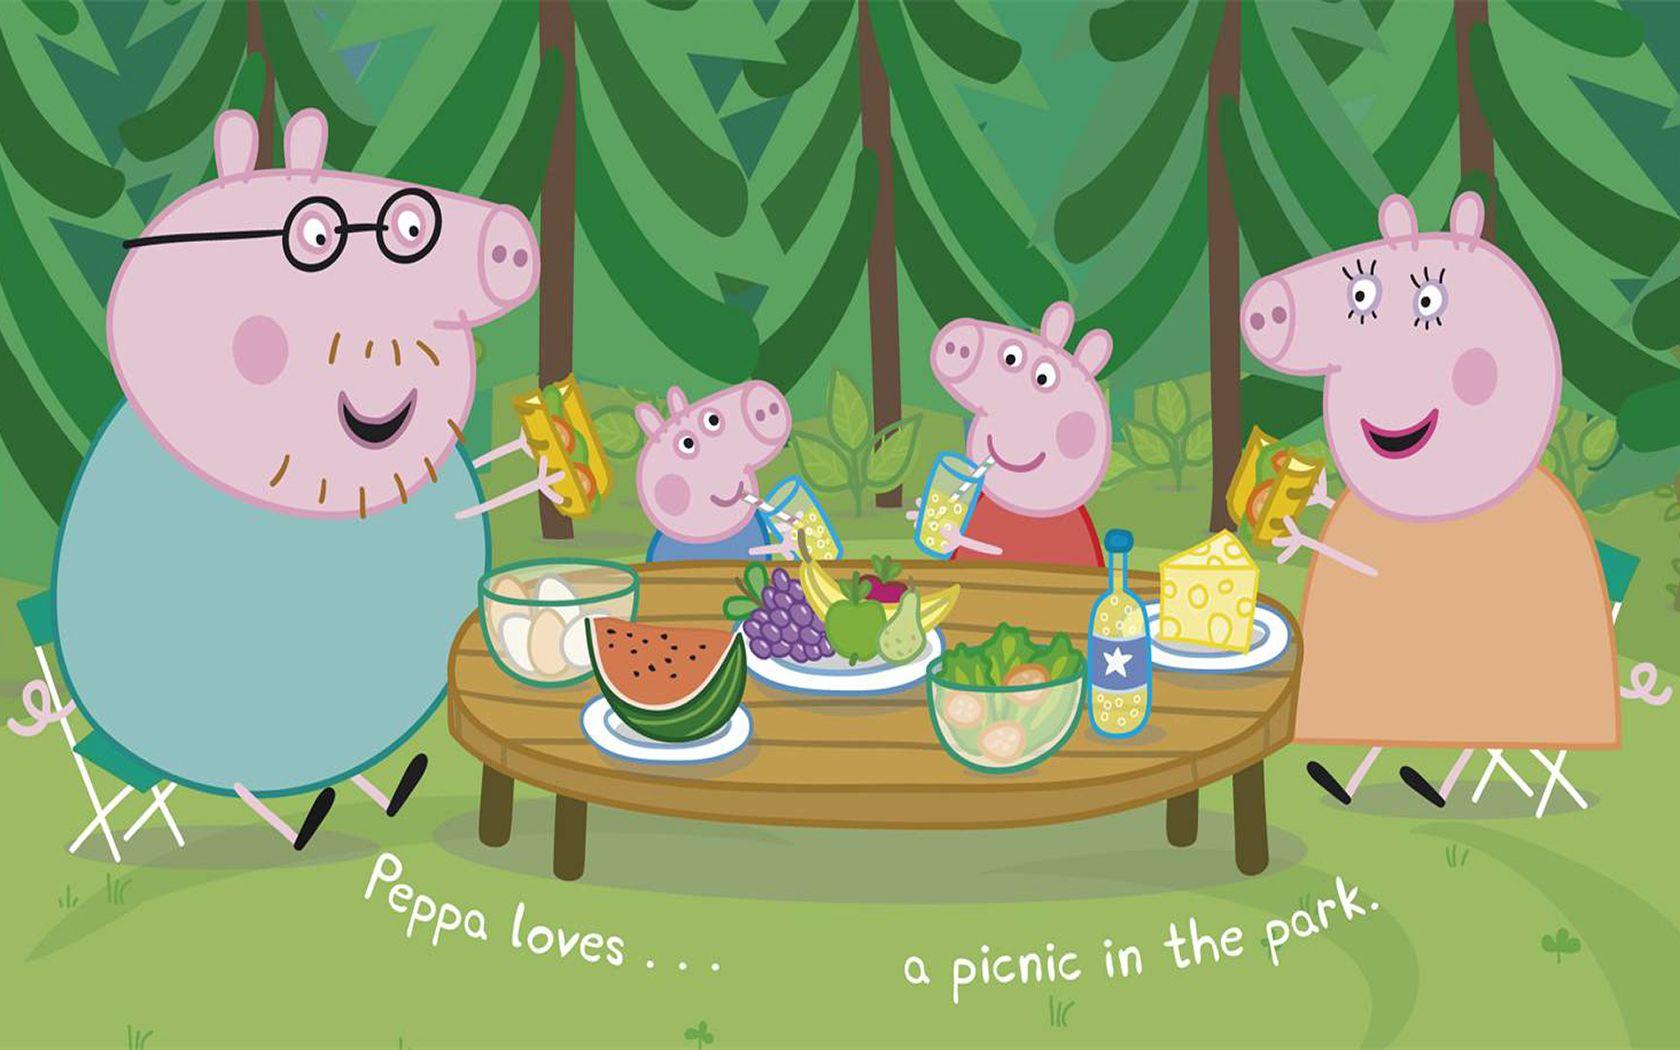 Cartoon Peppa Pig Wallpaper Peppa pig wallpaper, Pig